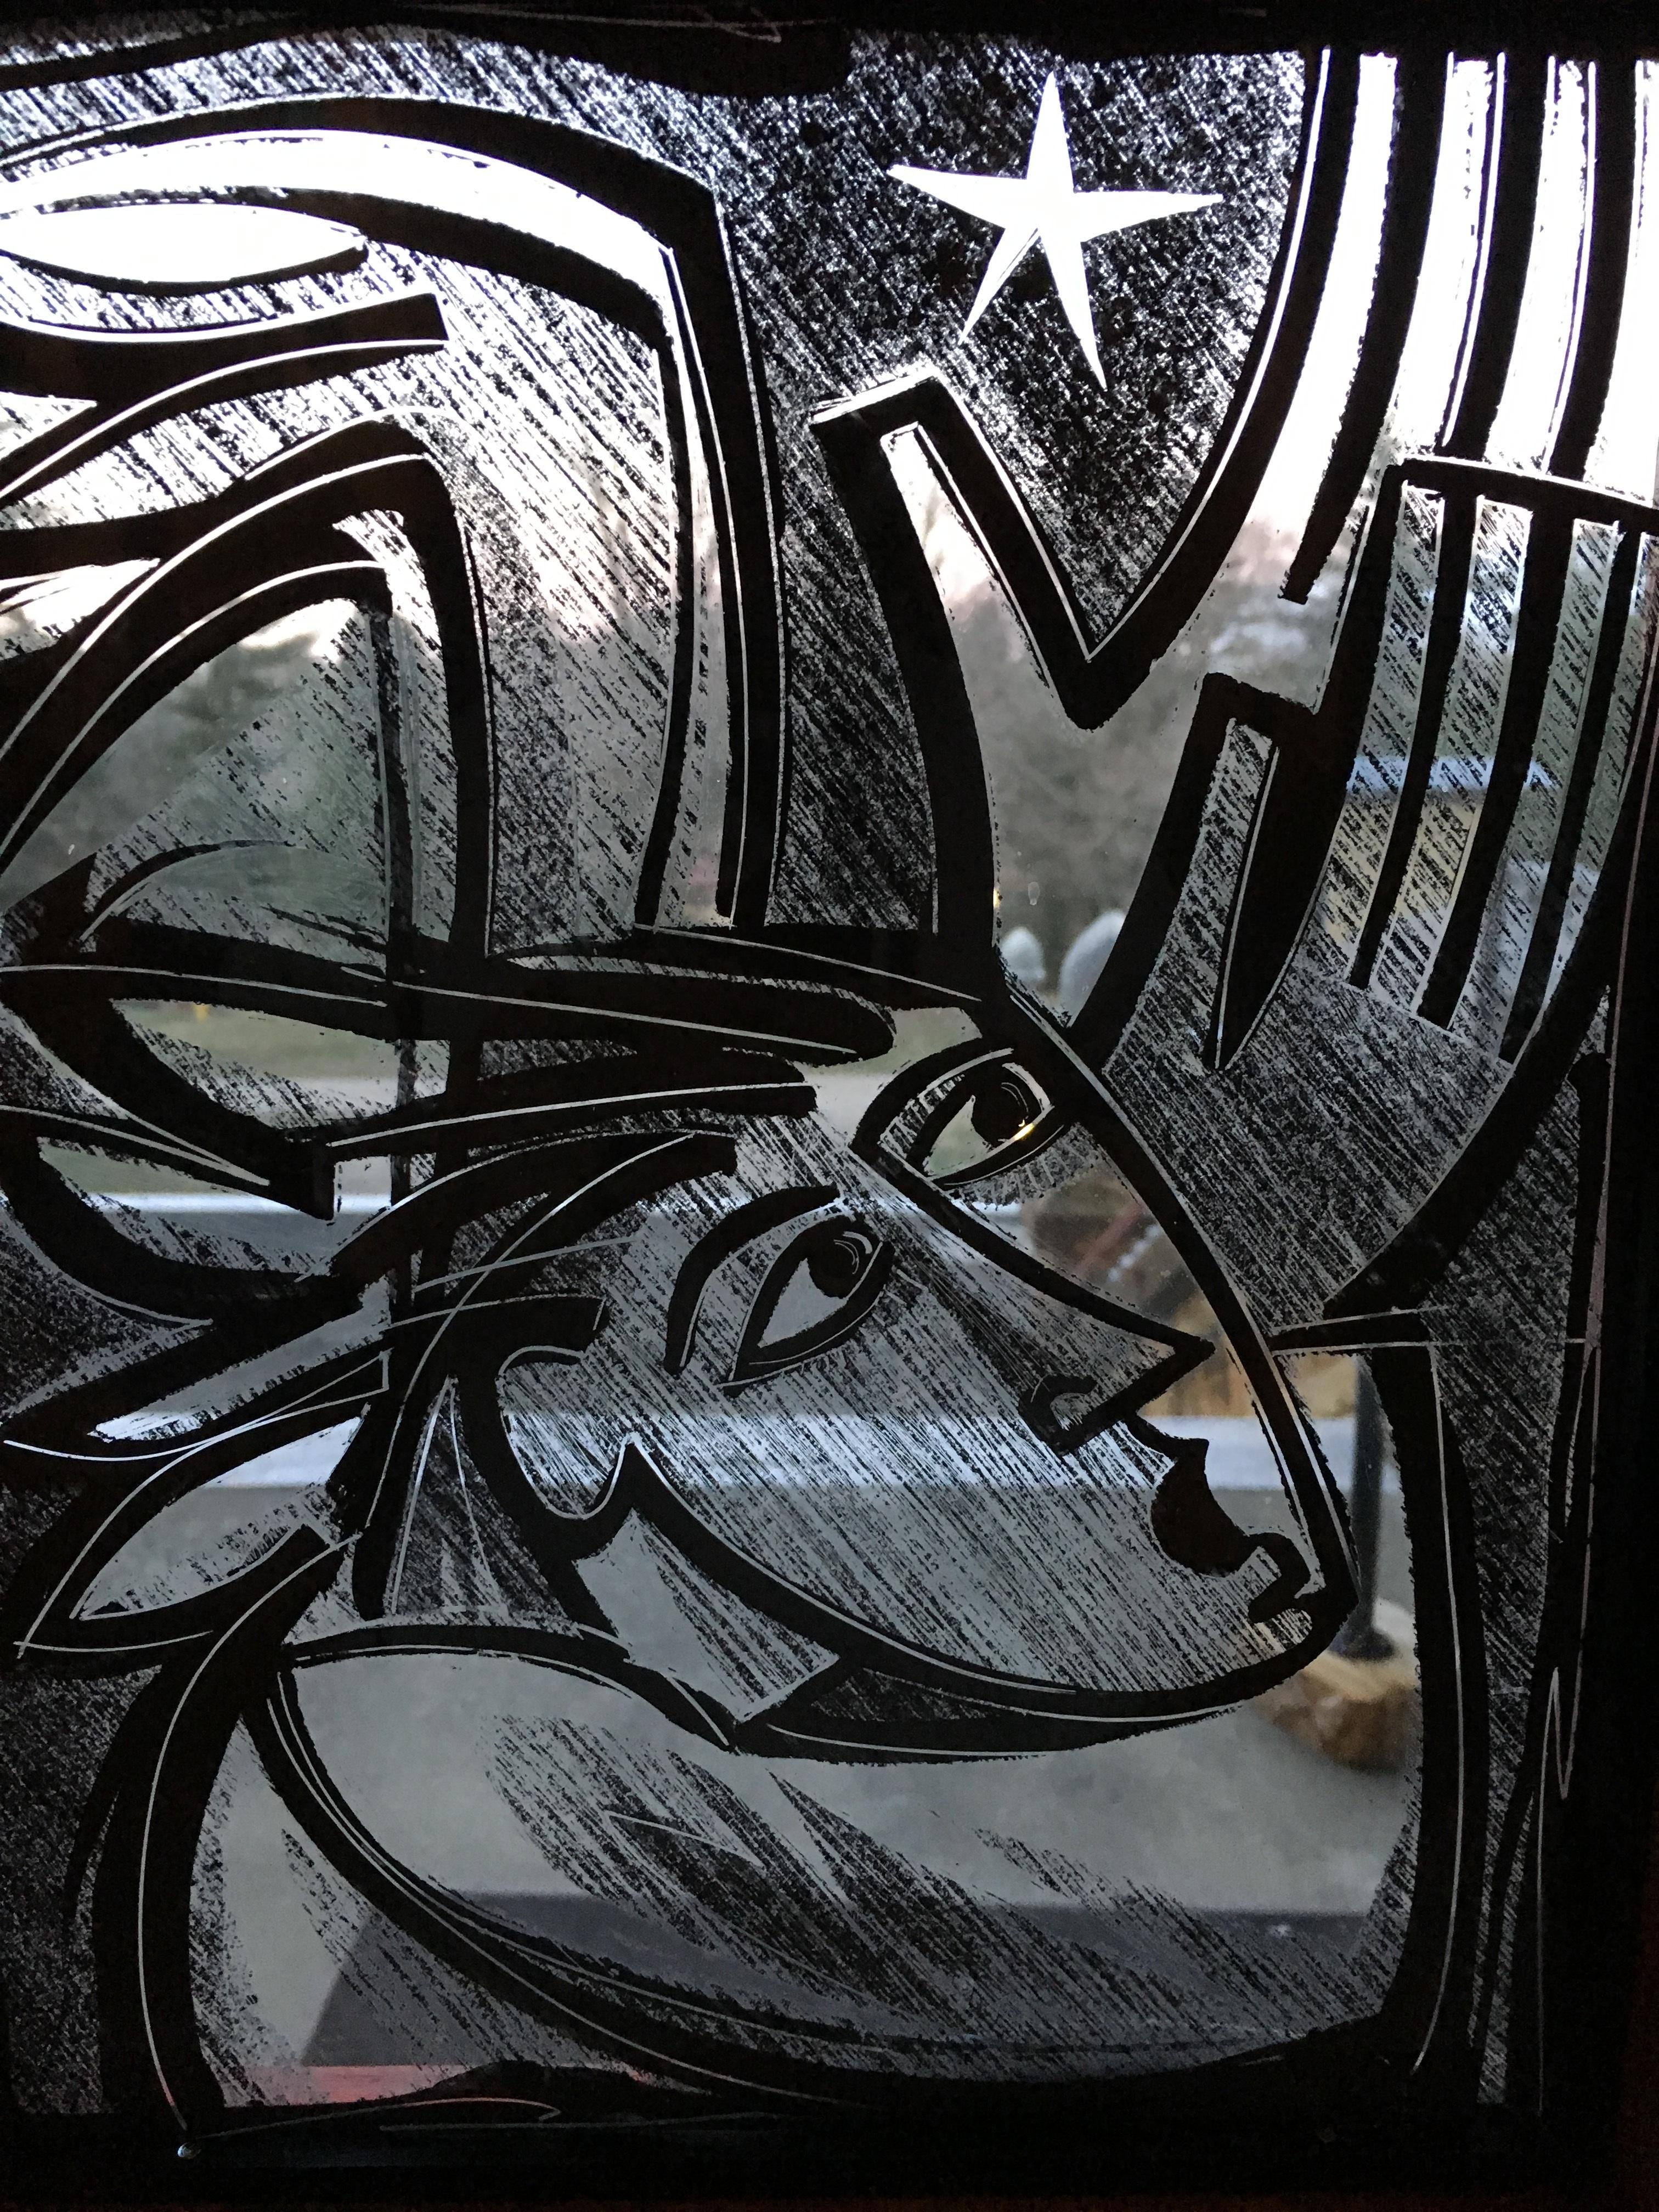 Free images light architecture window glass building old religion landmark church historic cross black monochrome christian door decor bible spiritual son vatican religious catholic christ altavistaventures Gallery